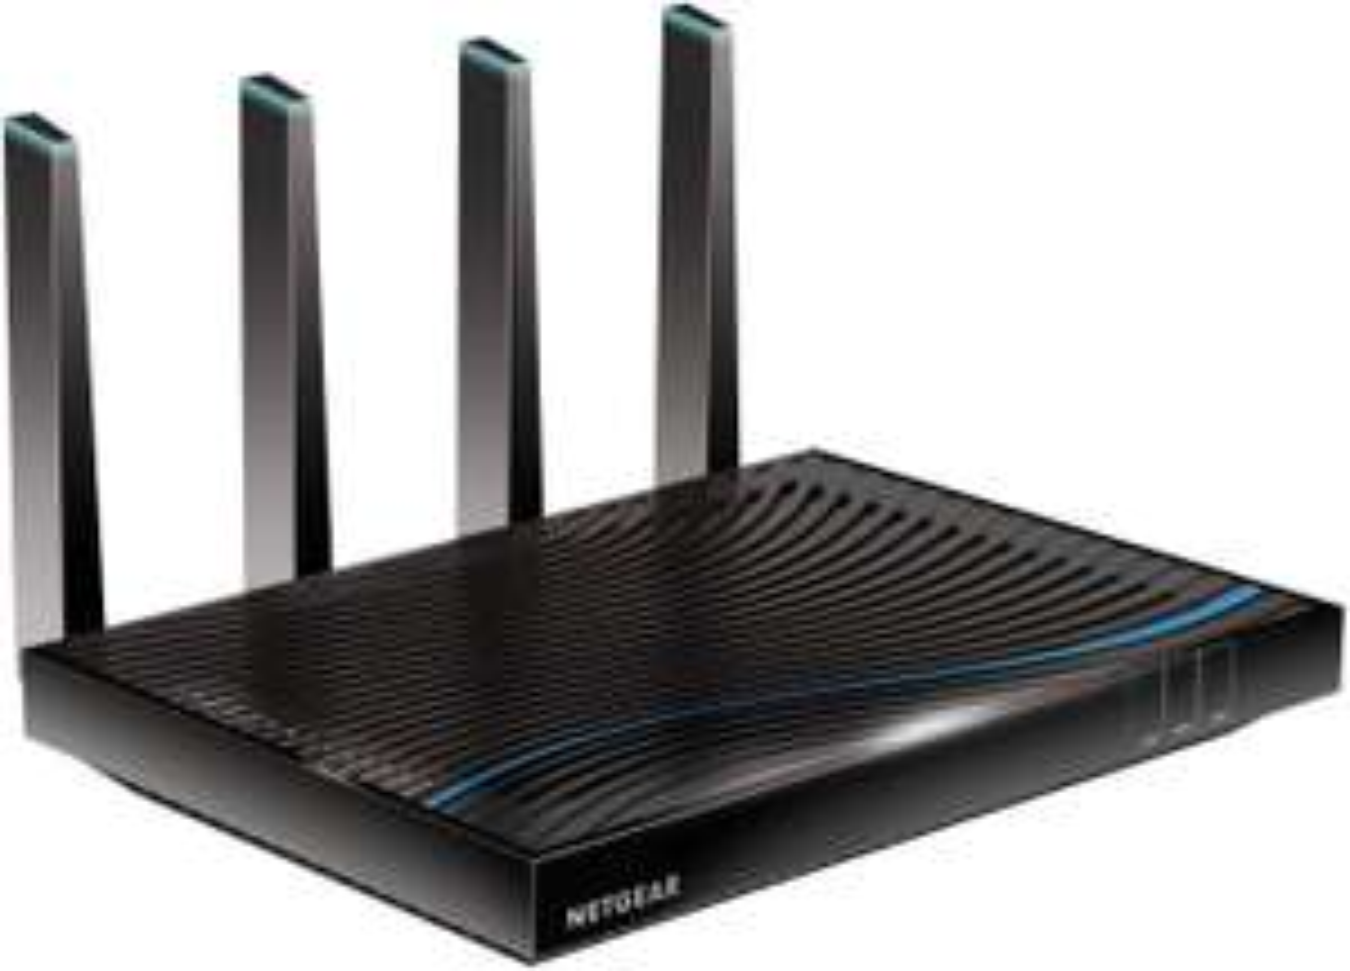 Routeur gigabit Wi-Fi Netgear Nighthawk X8